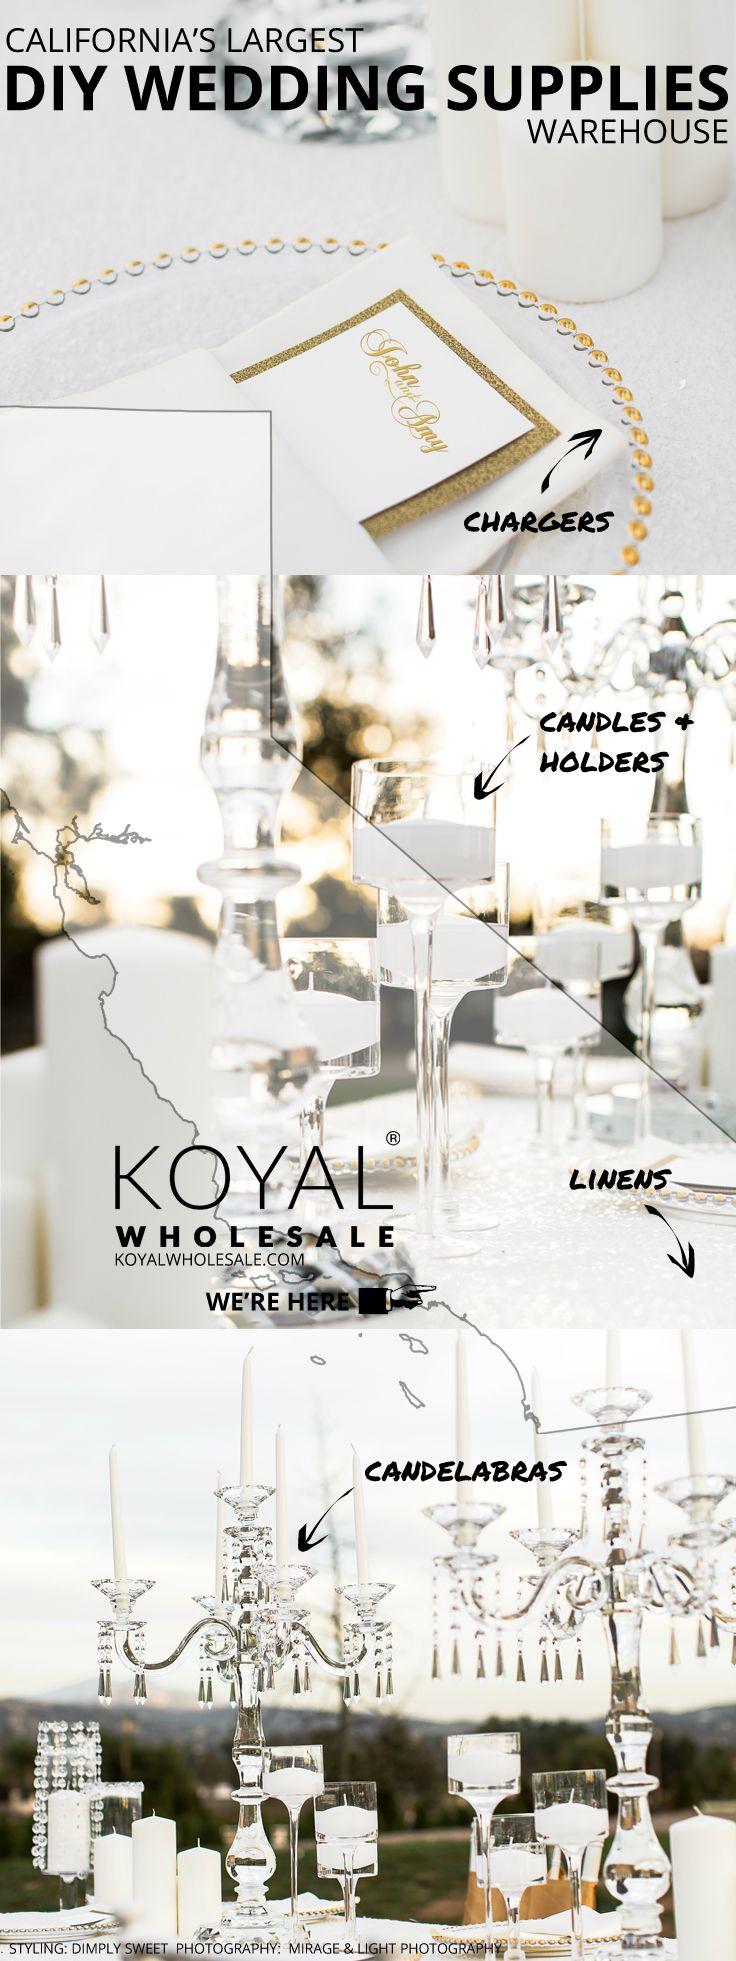 Koyal Wholesale Largest Diy Wholesale Wedding Supplies Warehouse In Southern Calif Wedding Supplies Wholesale Diy Wedding Supplies Personalized Wedding Decor